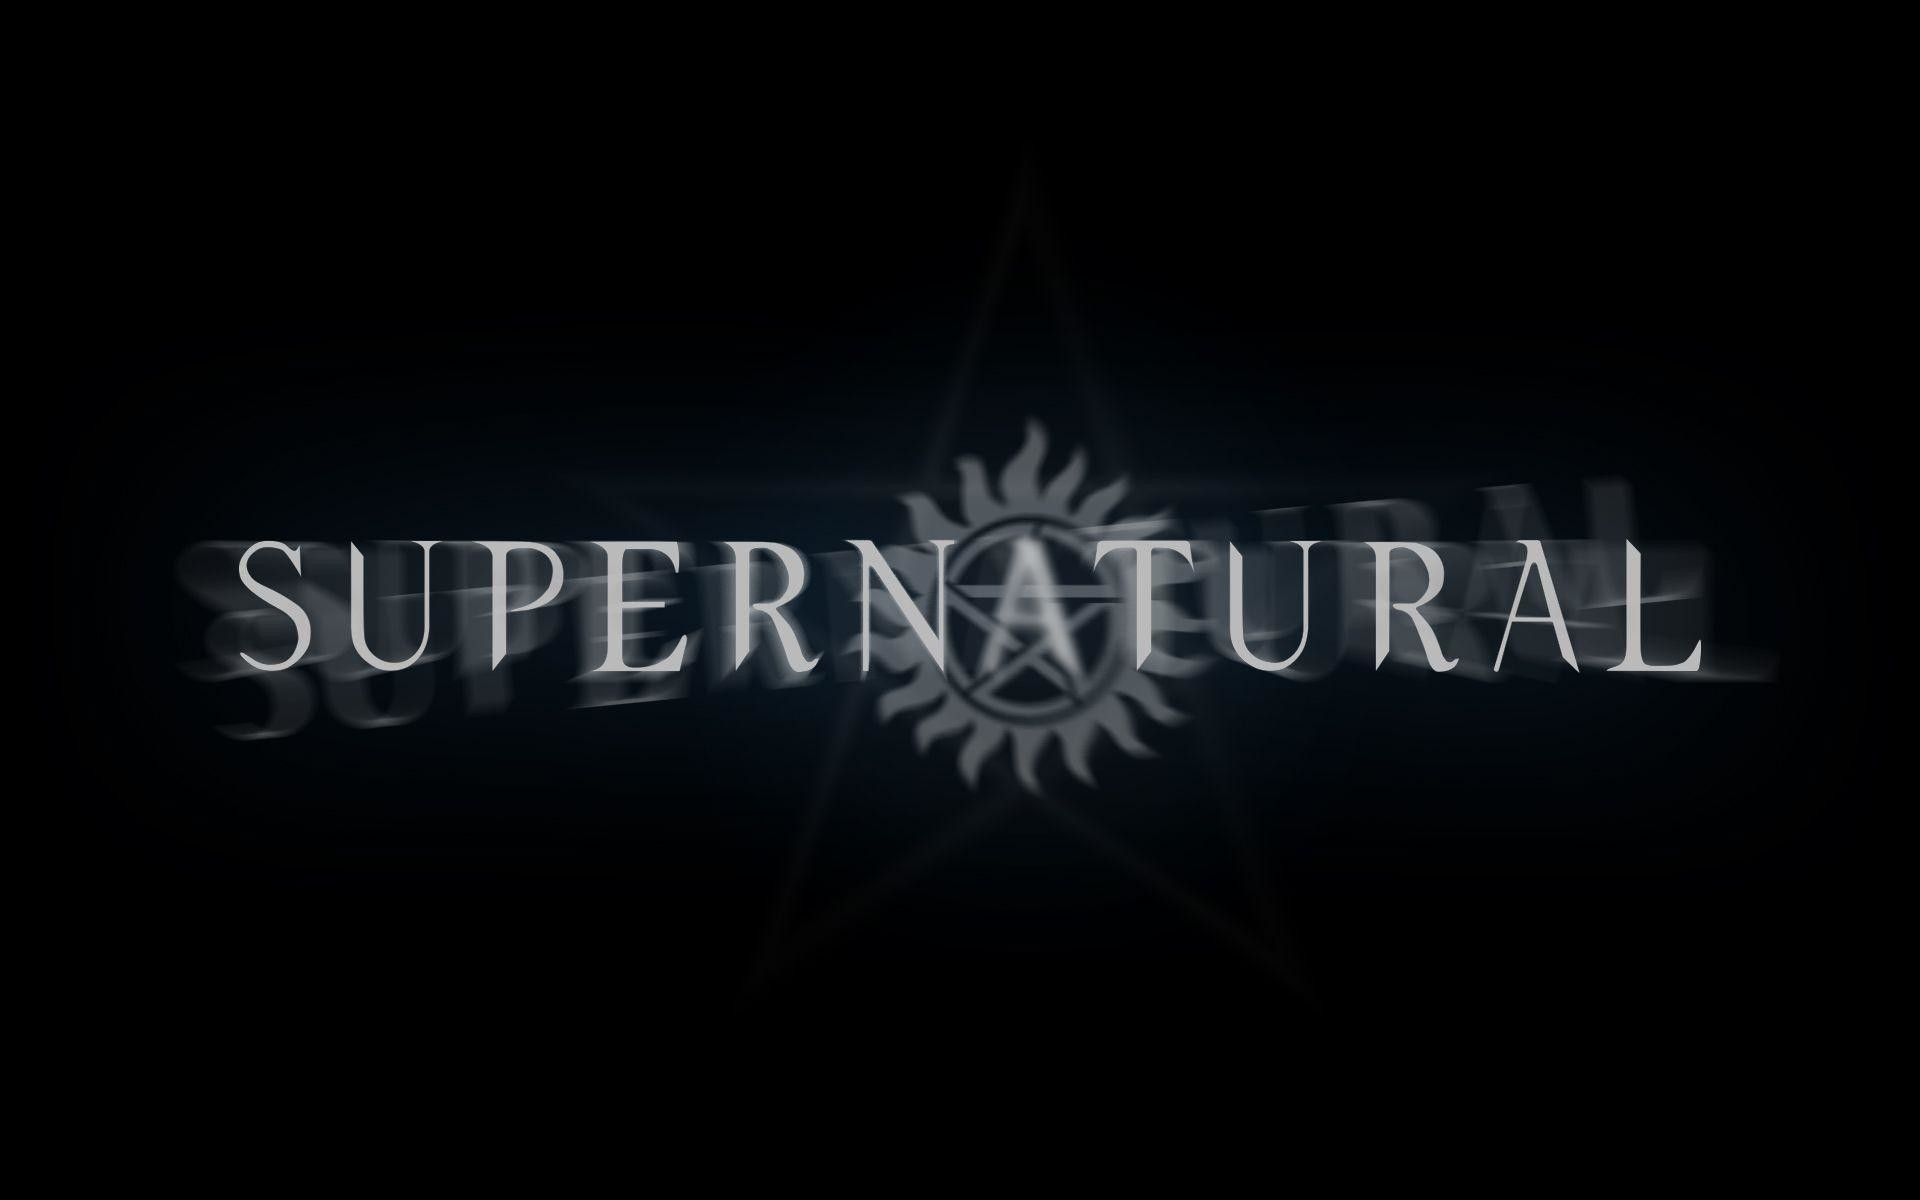 Logo Supernatural Wallpaper | Wallpapers, Backgrounds, Images, Art ..